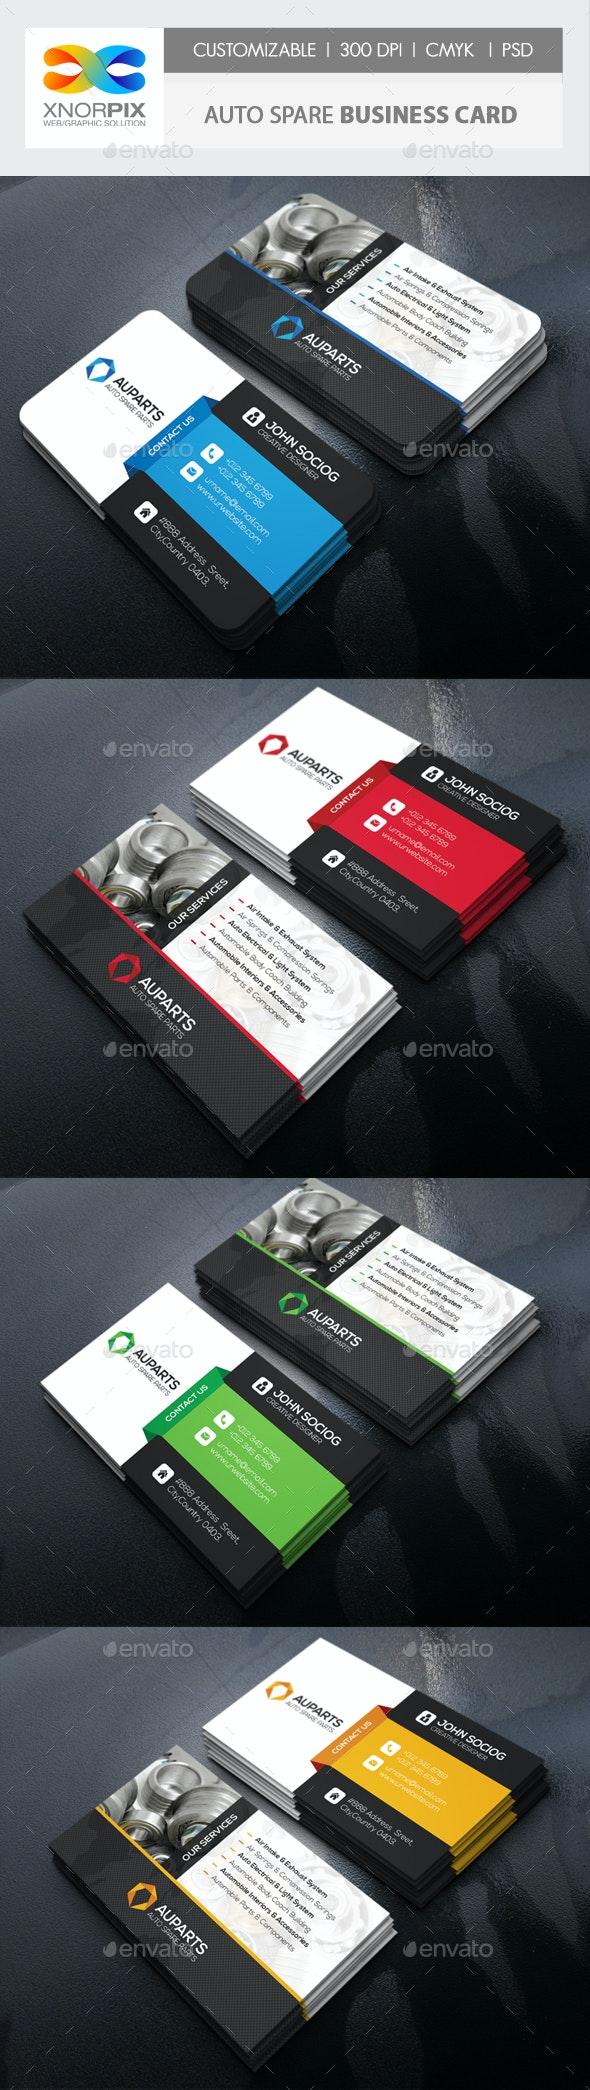 Auto Spare Business Card - Corporate Business Cards